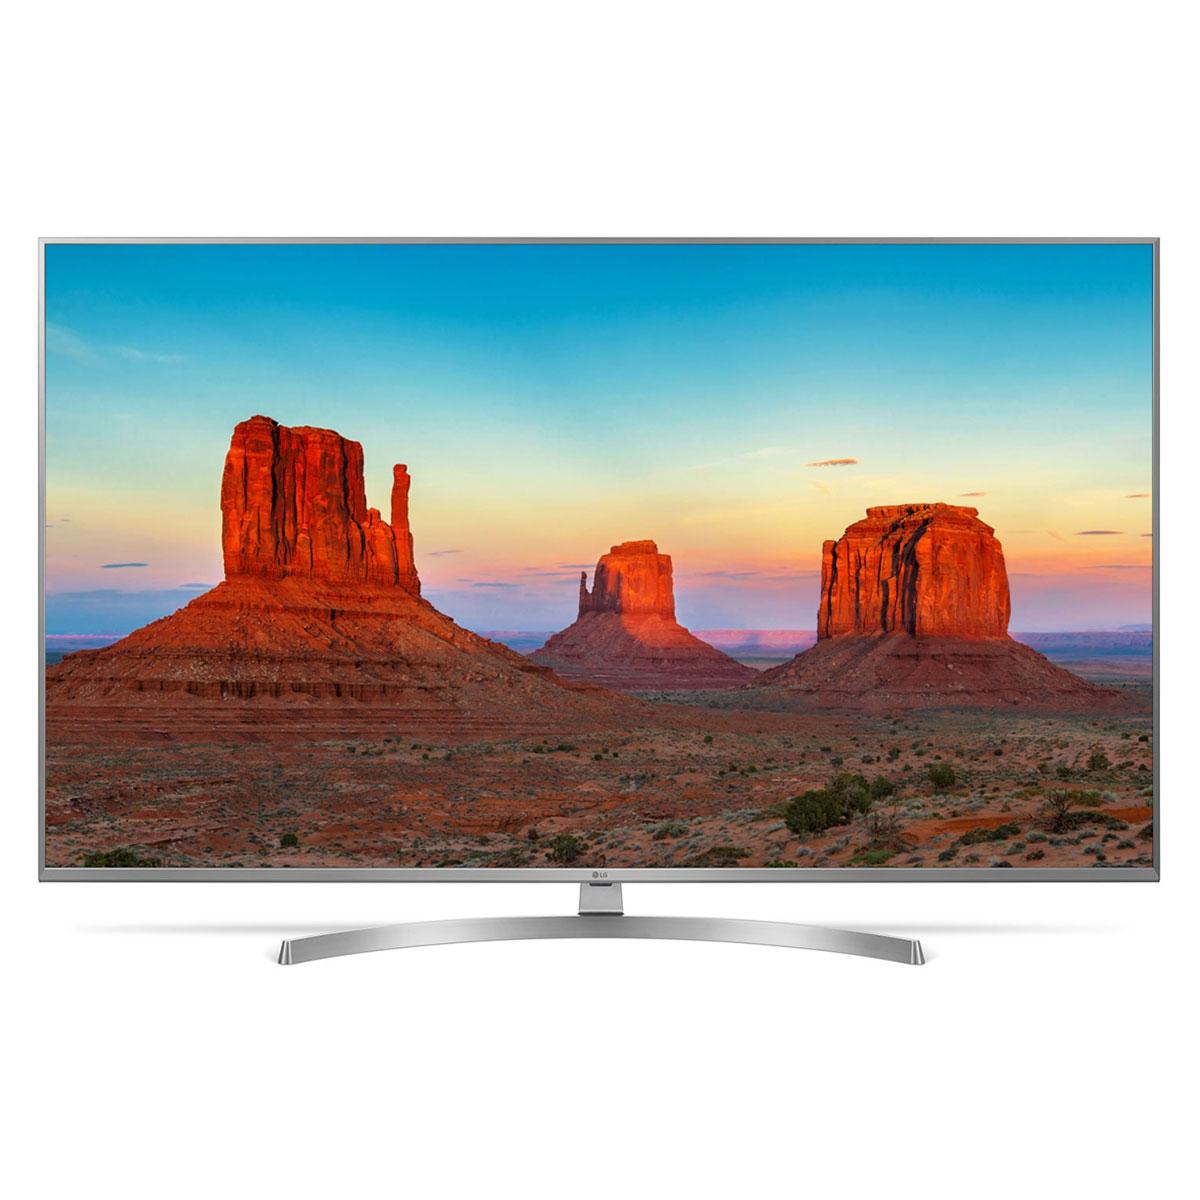 "TV LG 65UK7550 Téléviseur LED 4K 65"" (165 cm) 16/9 - 3840 x 2160 pixels - Ultra HD 2160p - HDR - Wi-Fi - Bluetooth - 100 Hz"